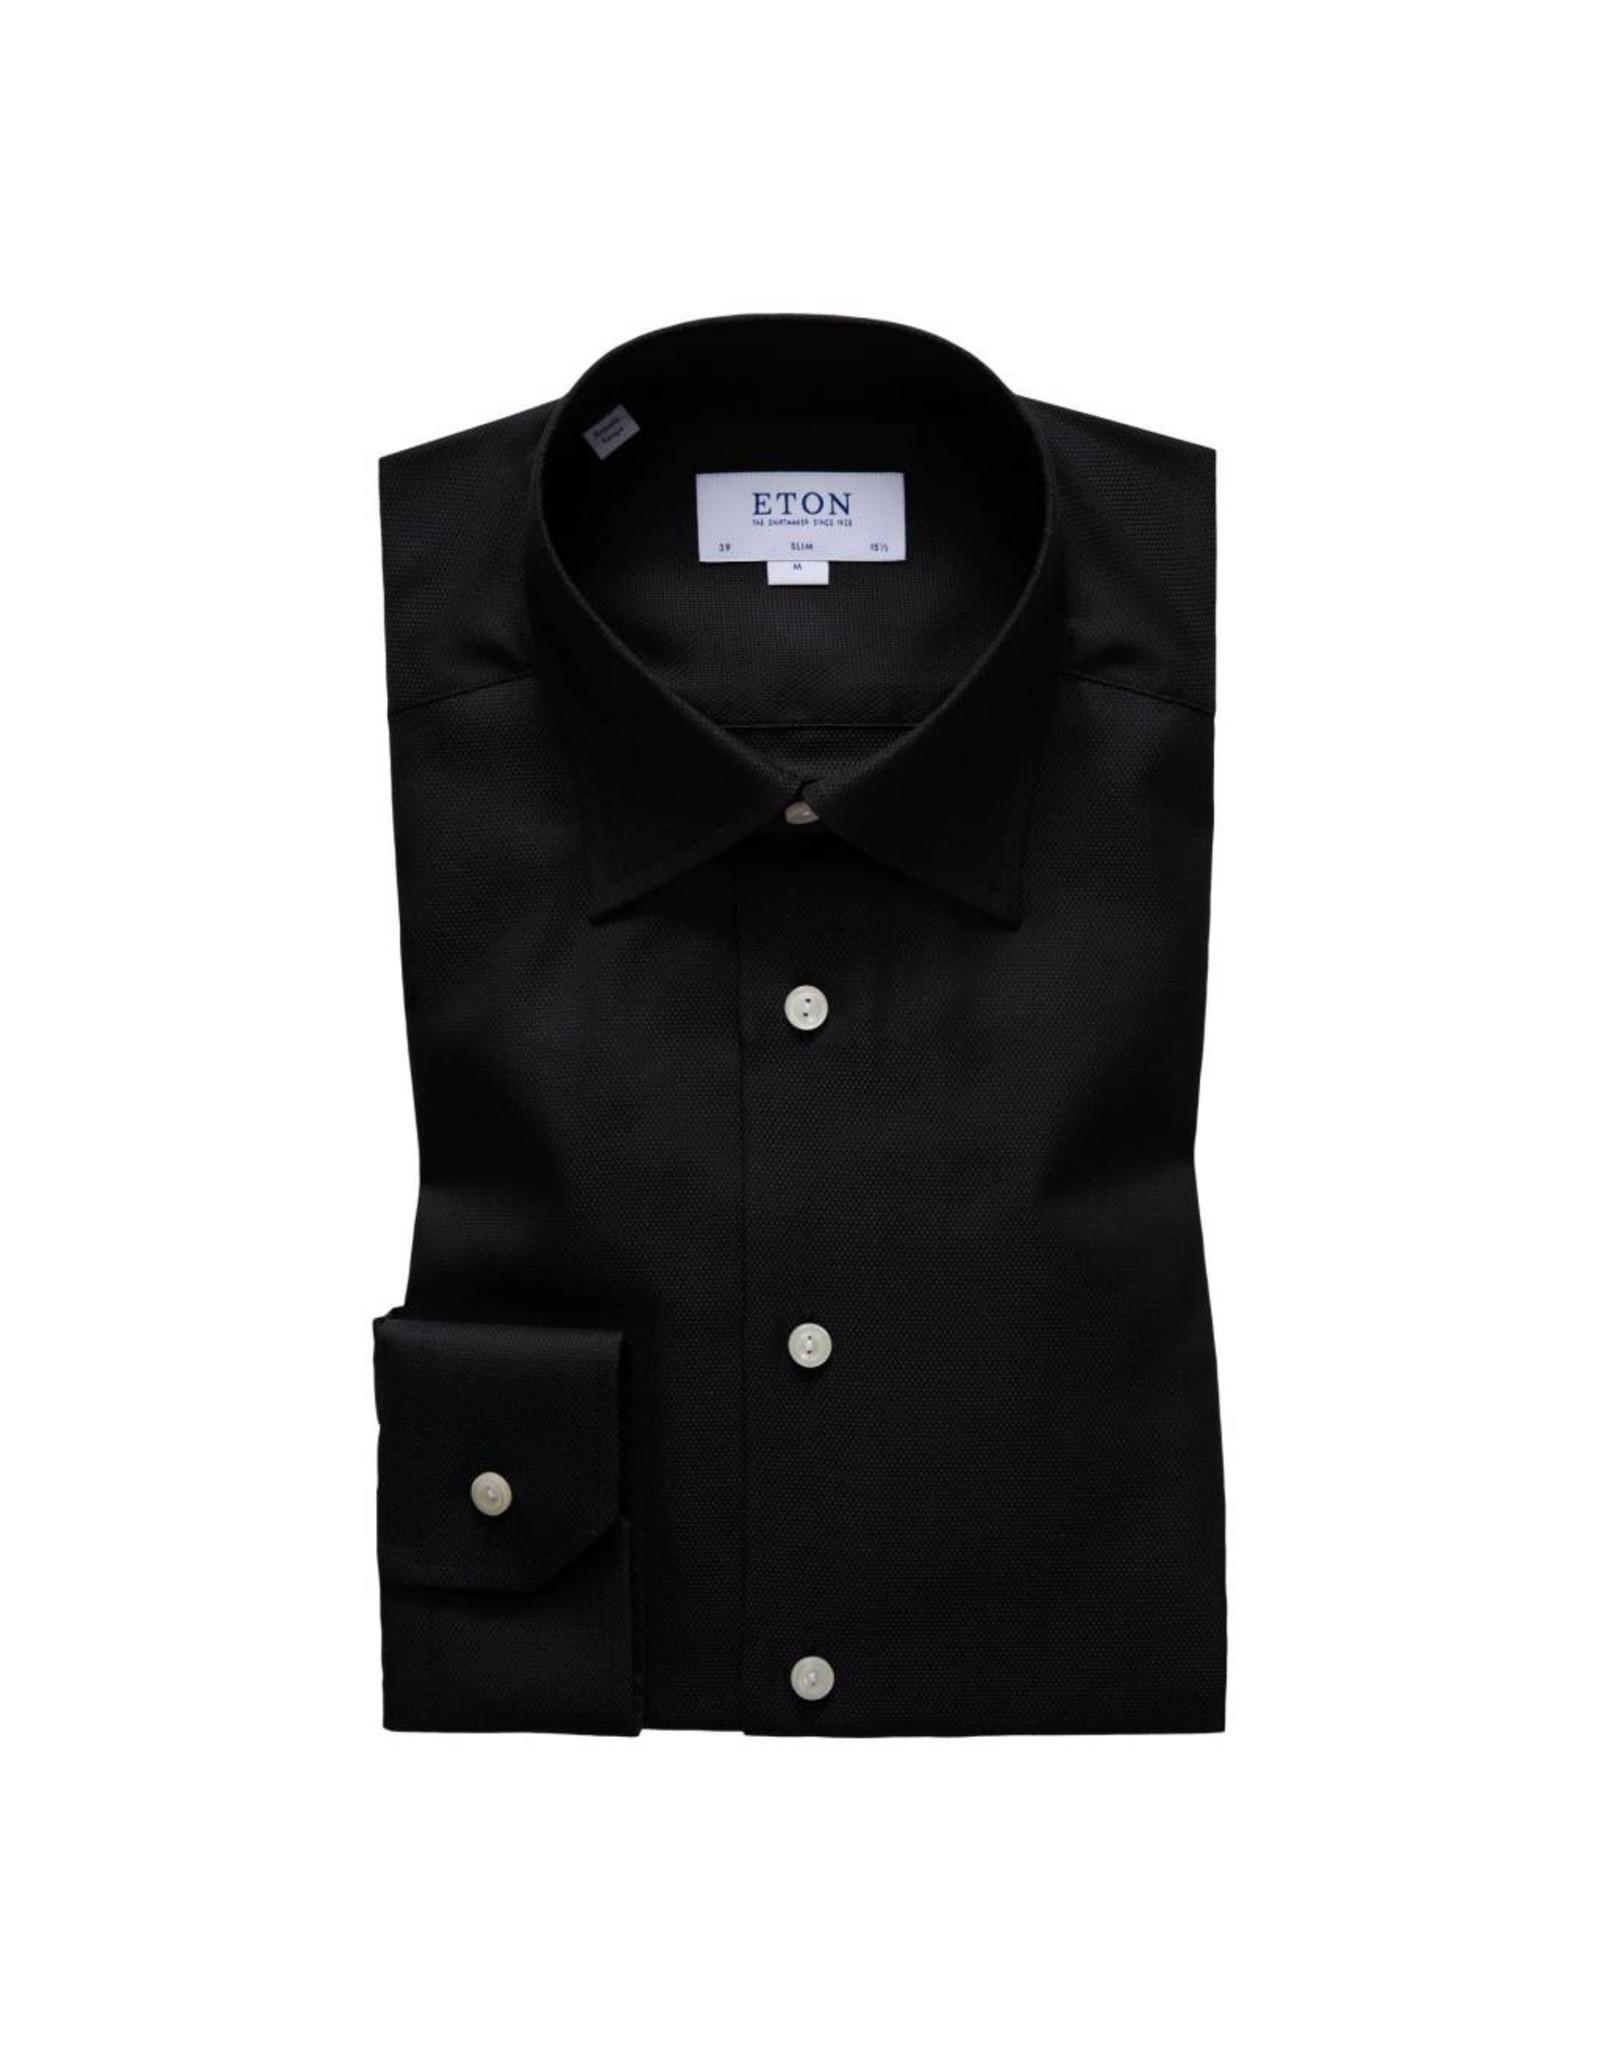 Eton Button Collar Shirt Black